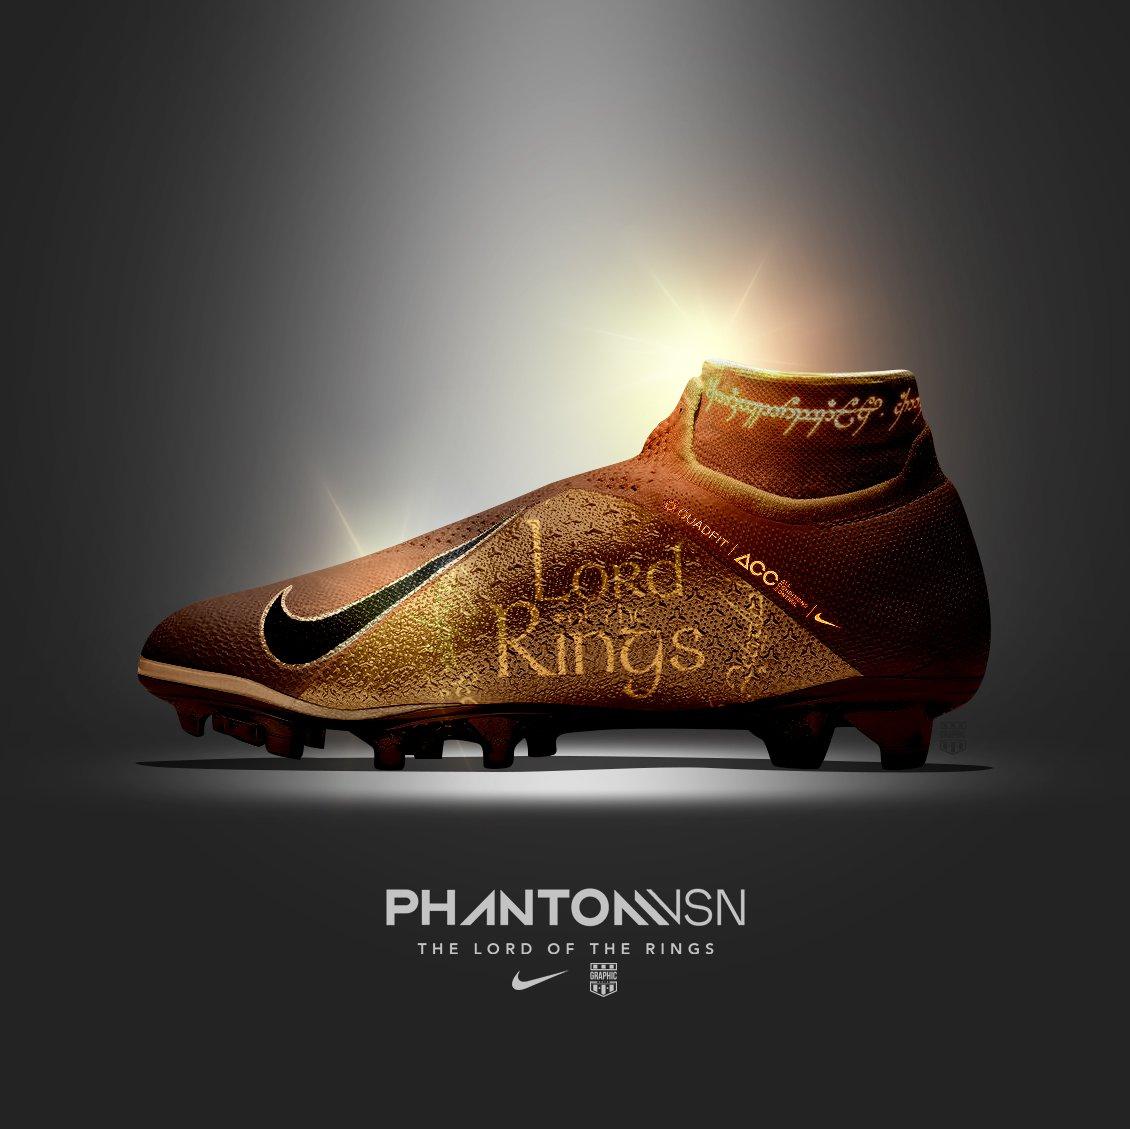 nike-phantom-vision-7eme-art-graphic-united-le-seigneur-des-anneaux